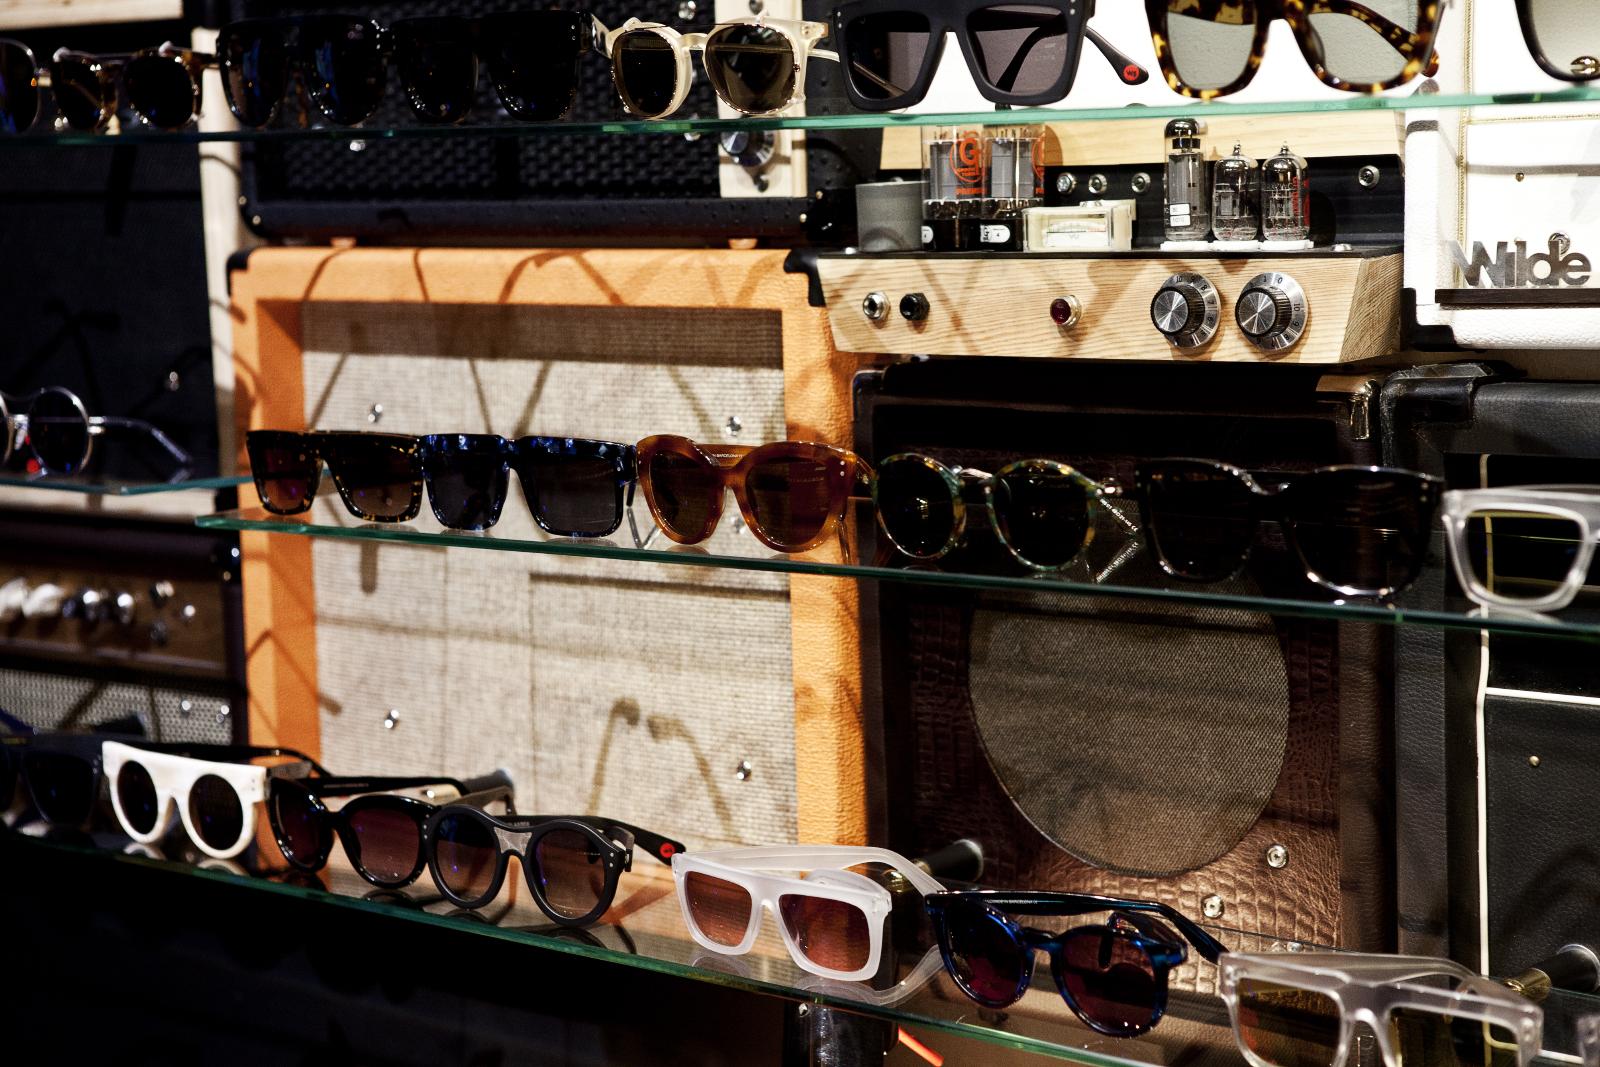 Robert_Adalierd_Rob_Design_Furniture_Wilde_sunglasses4.jpg